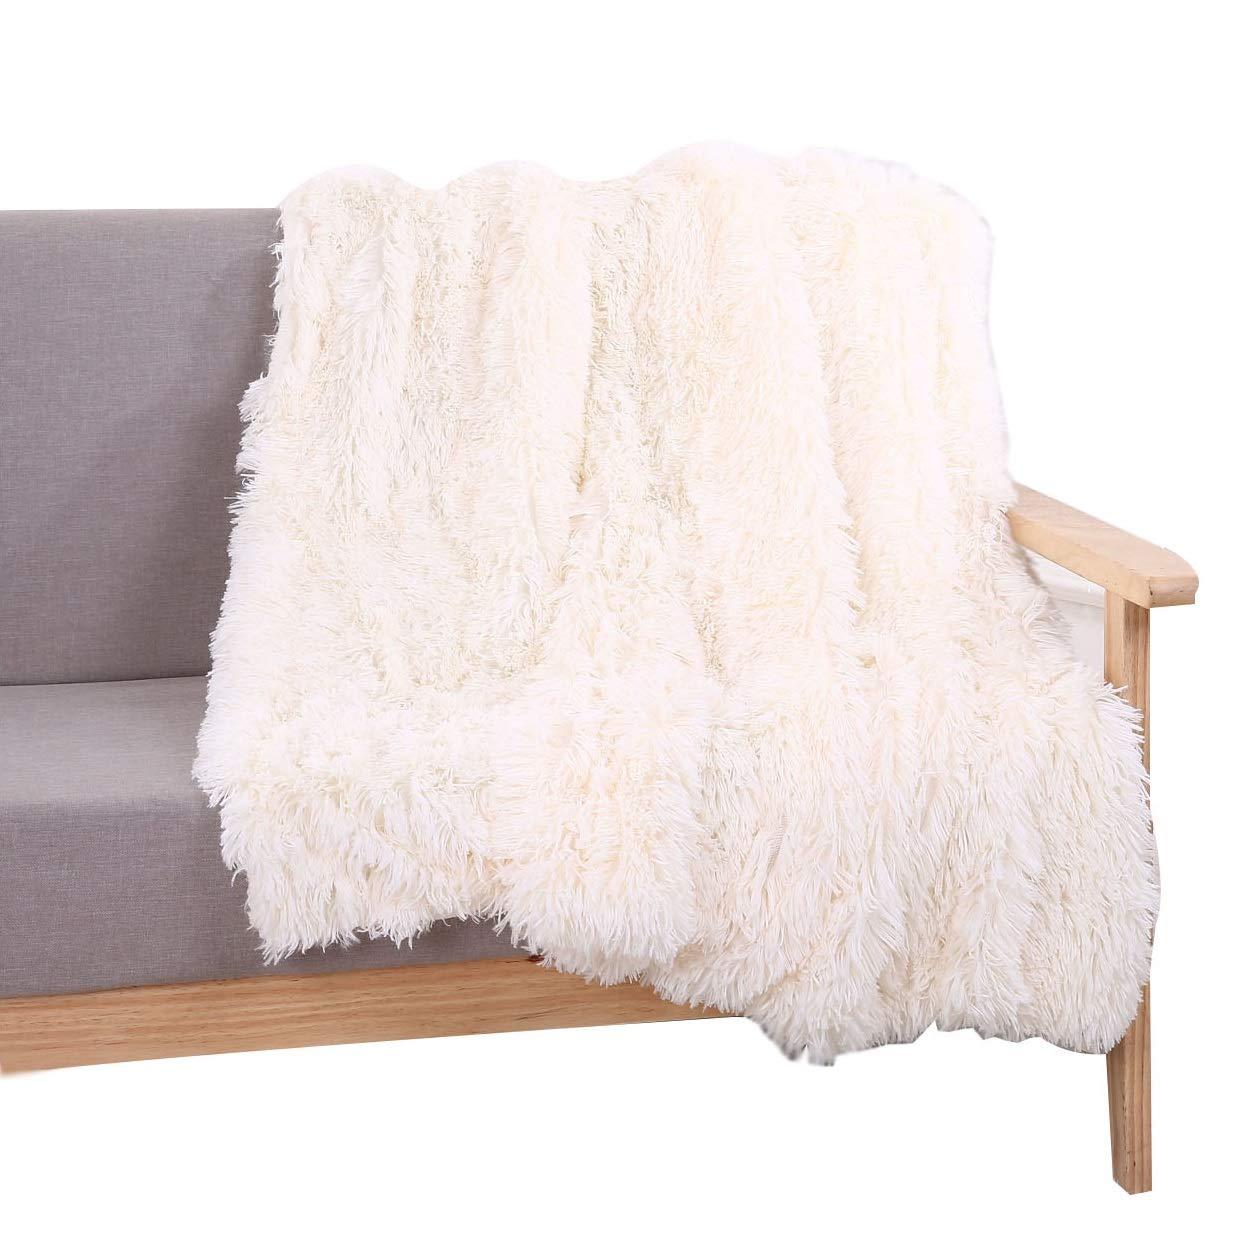 Amazon.com  YOUSA Super Soft Shaggy Faux Fur Blanket Ultra Plush Decorative  Throw Blanket 51  63   9510f27135442